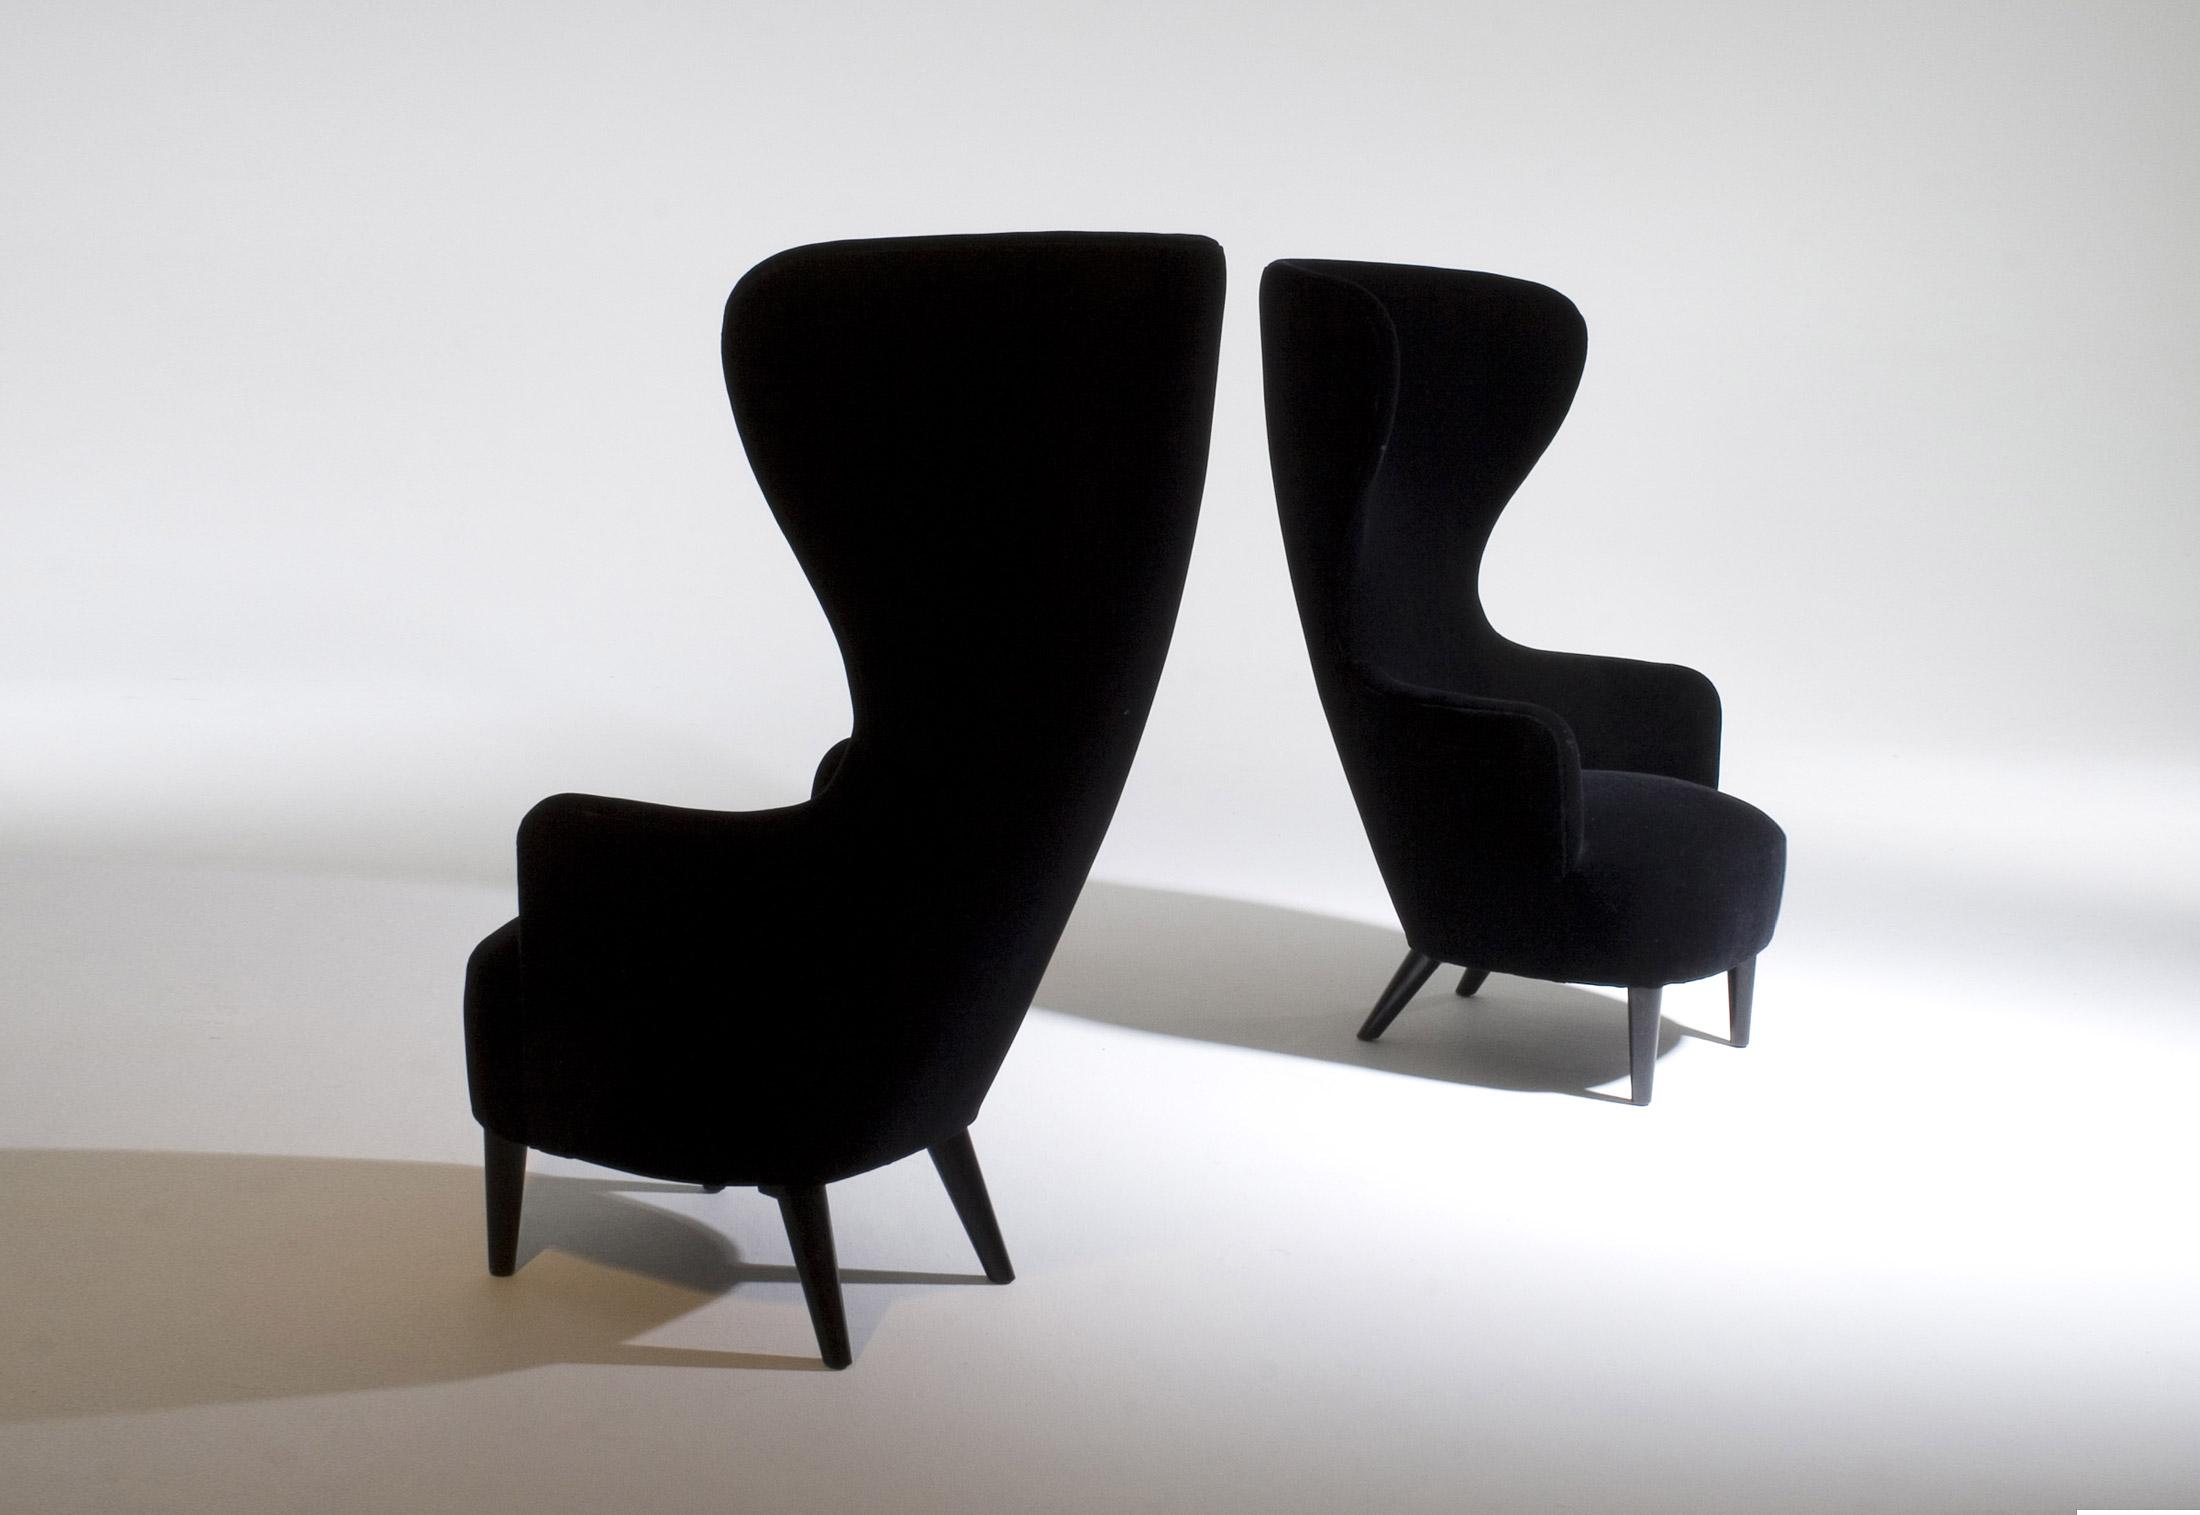 Wingback chair tom dixon - Wingback Chair Wingback Chair Wingback Chair